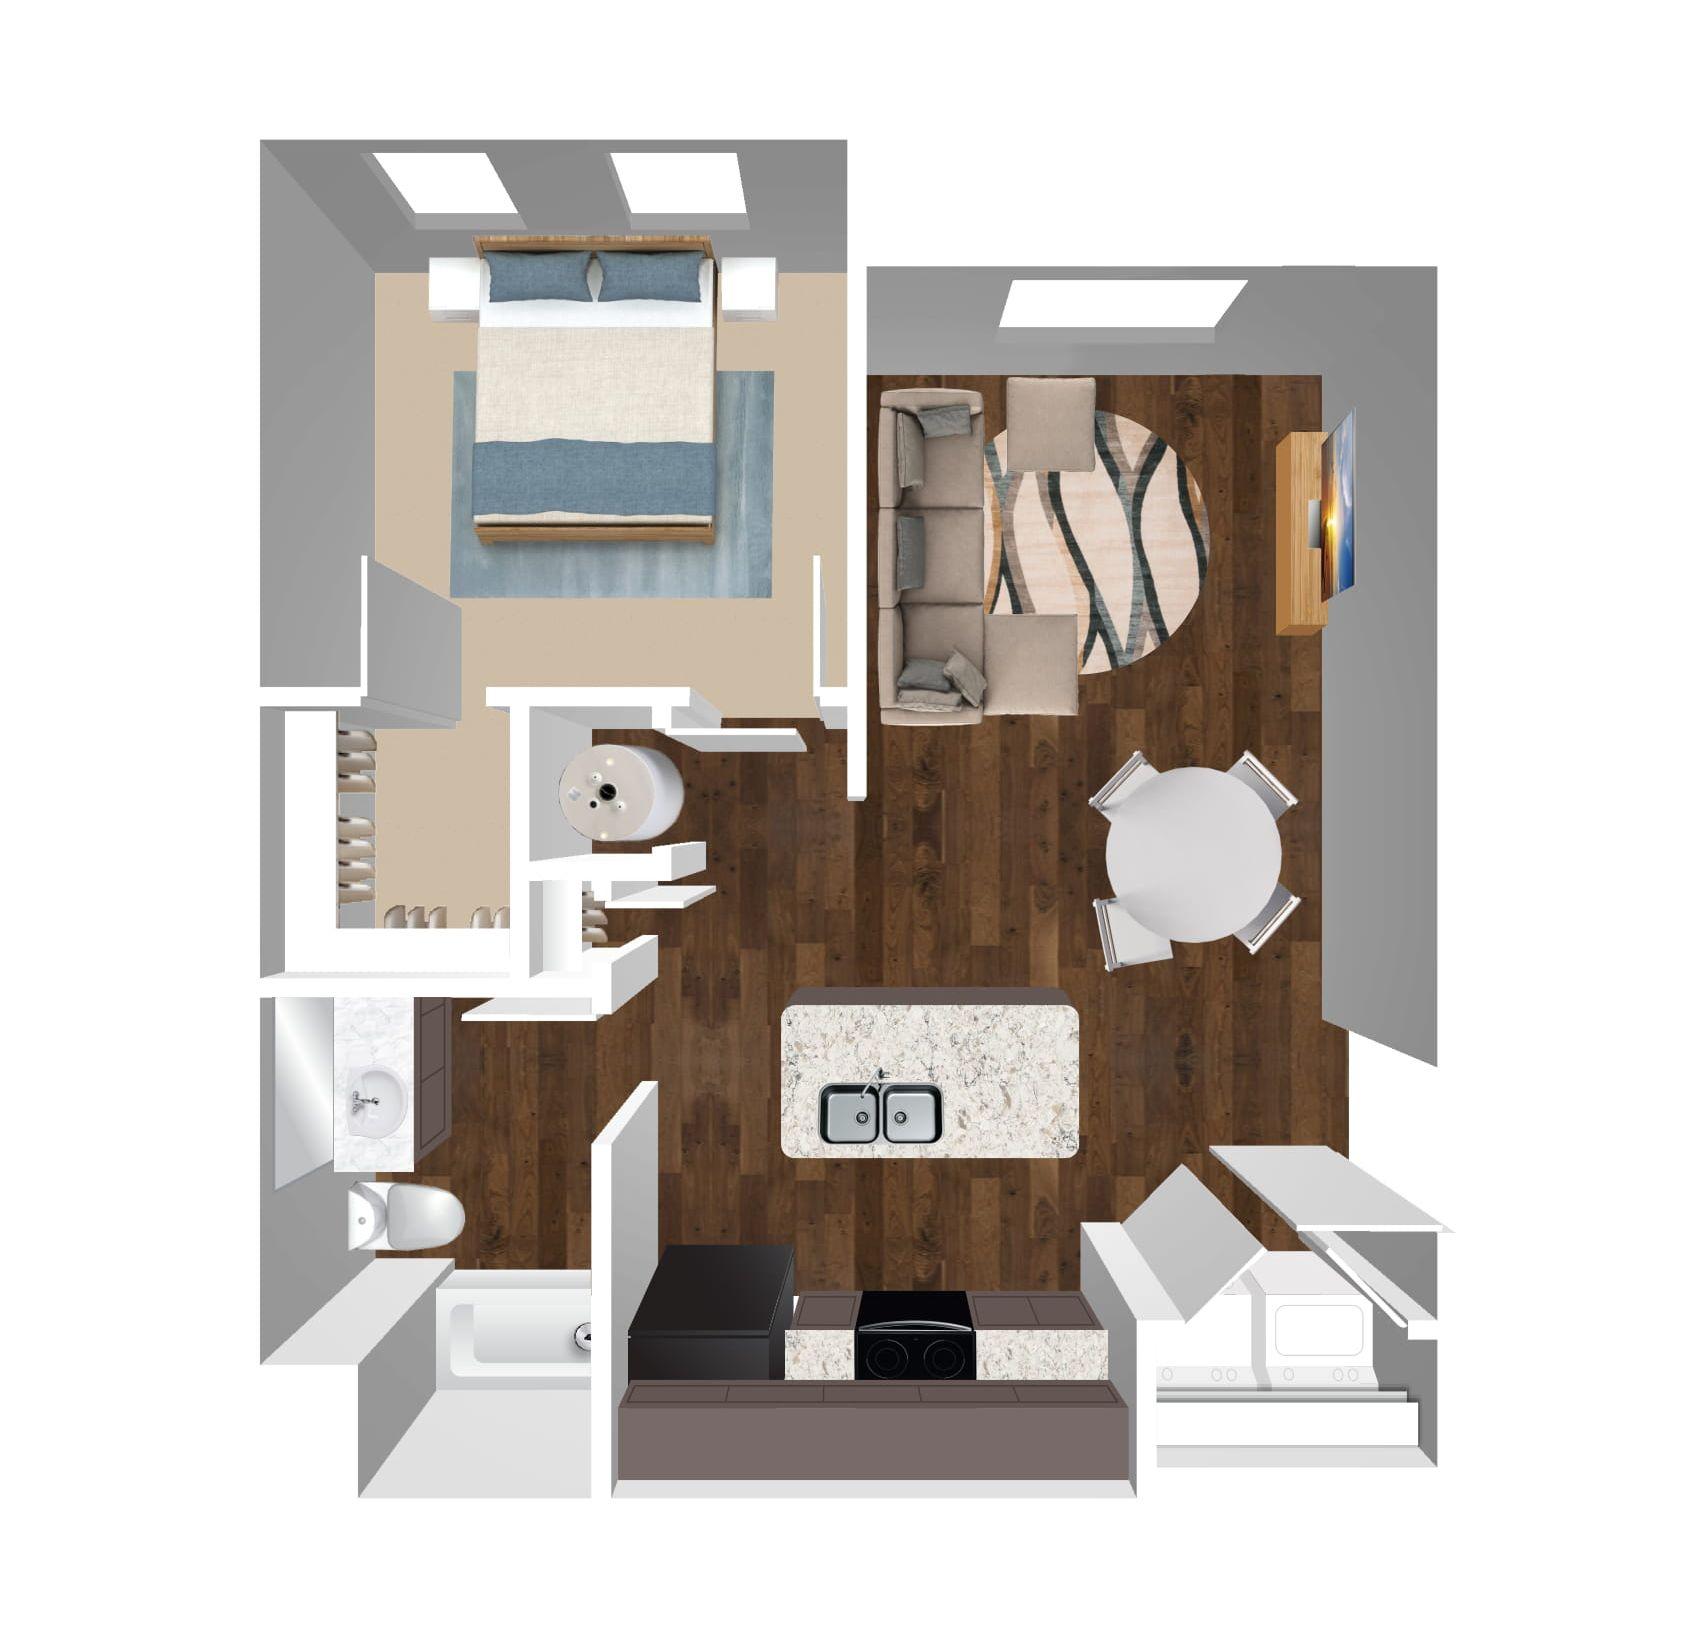 Eagle Ridge Apartments Apartments In Tarpon Springs Fl